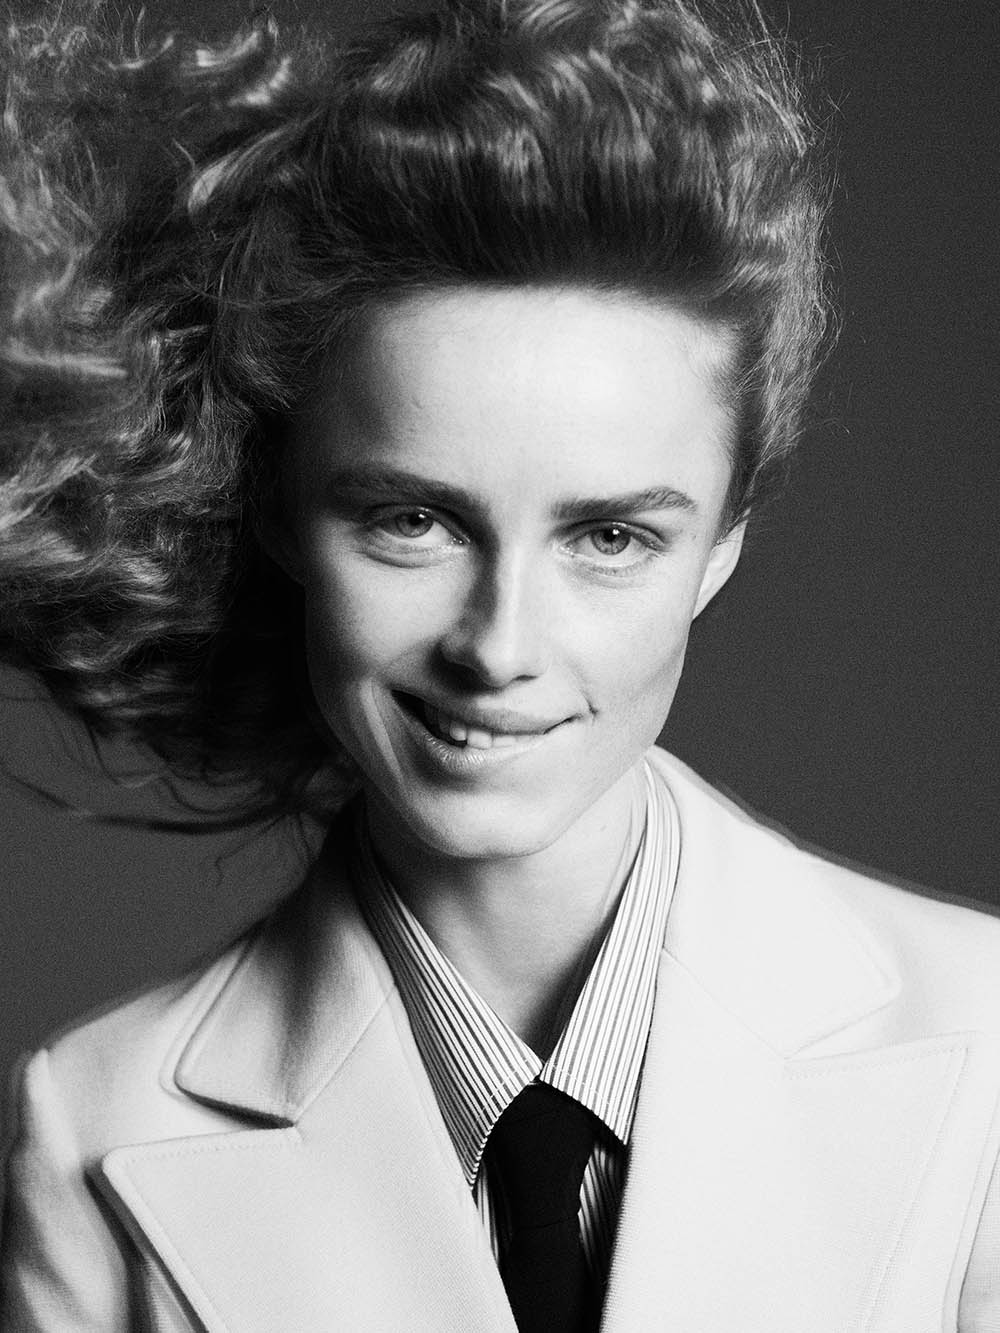 Rianne van Rompaey by Karim Sadli for W Magazine Volume 2 2020